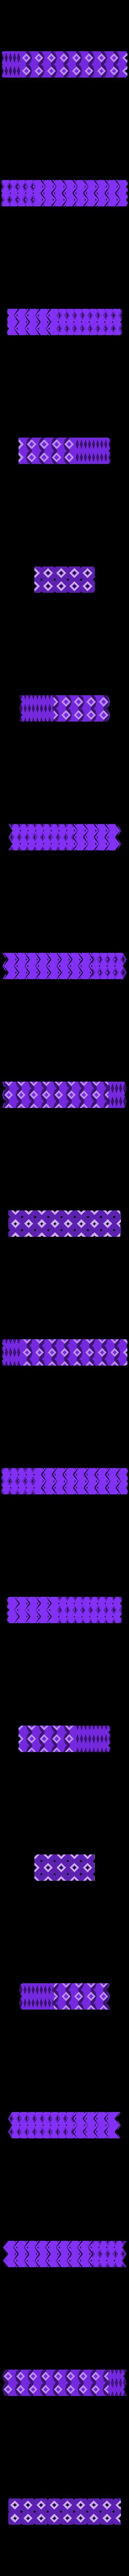 antiwarp_doublewall_8x4.stl Download free STL file Anti-Warping Block, Truncated Octahedrons • Model to 3D print, zootopia3Dprints